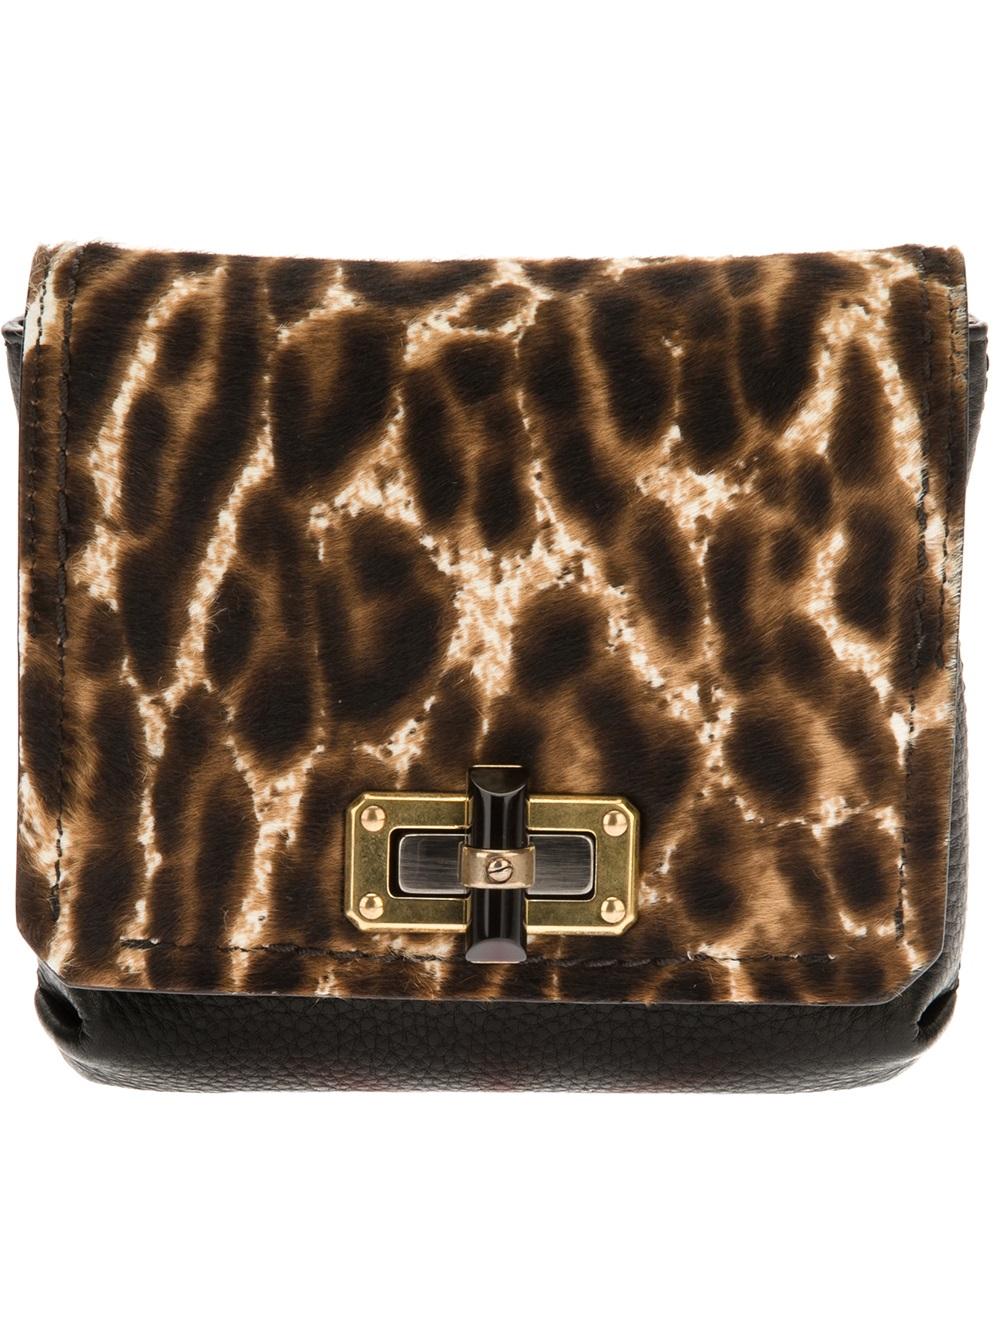 b5db25ffbe692e Lanvin Leopard Print Crossbody Bag in Brown - Lyst